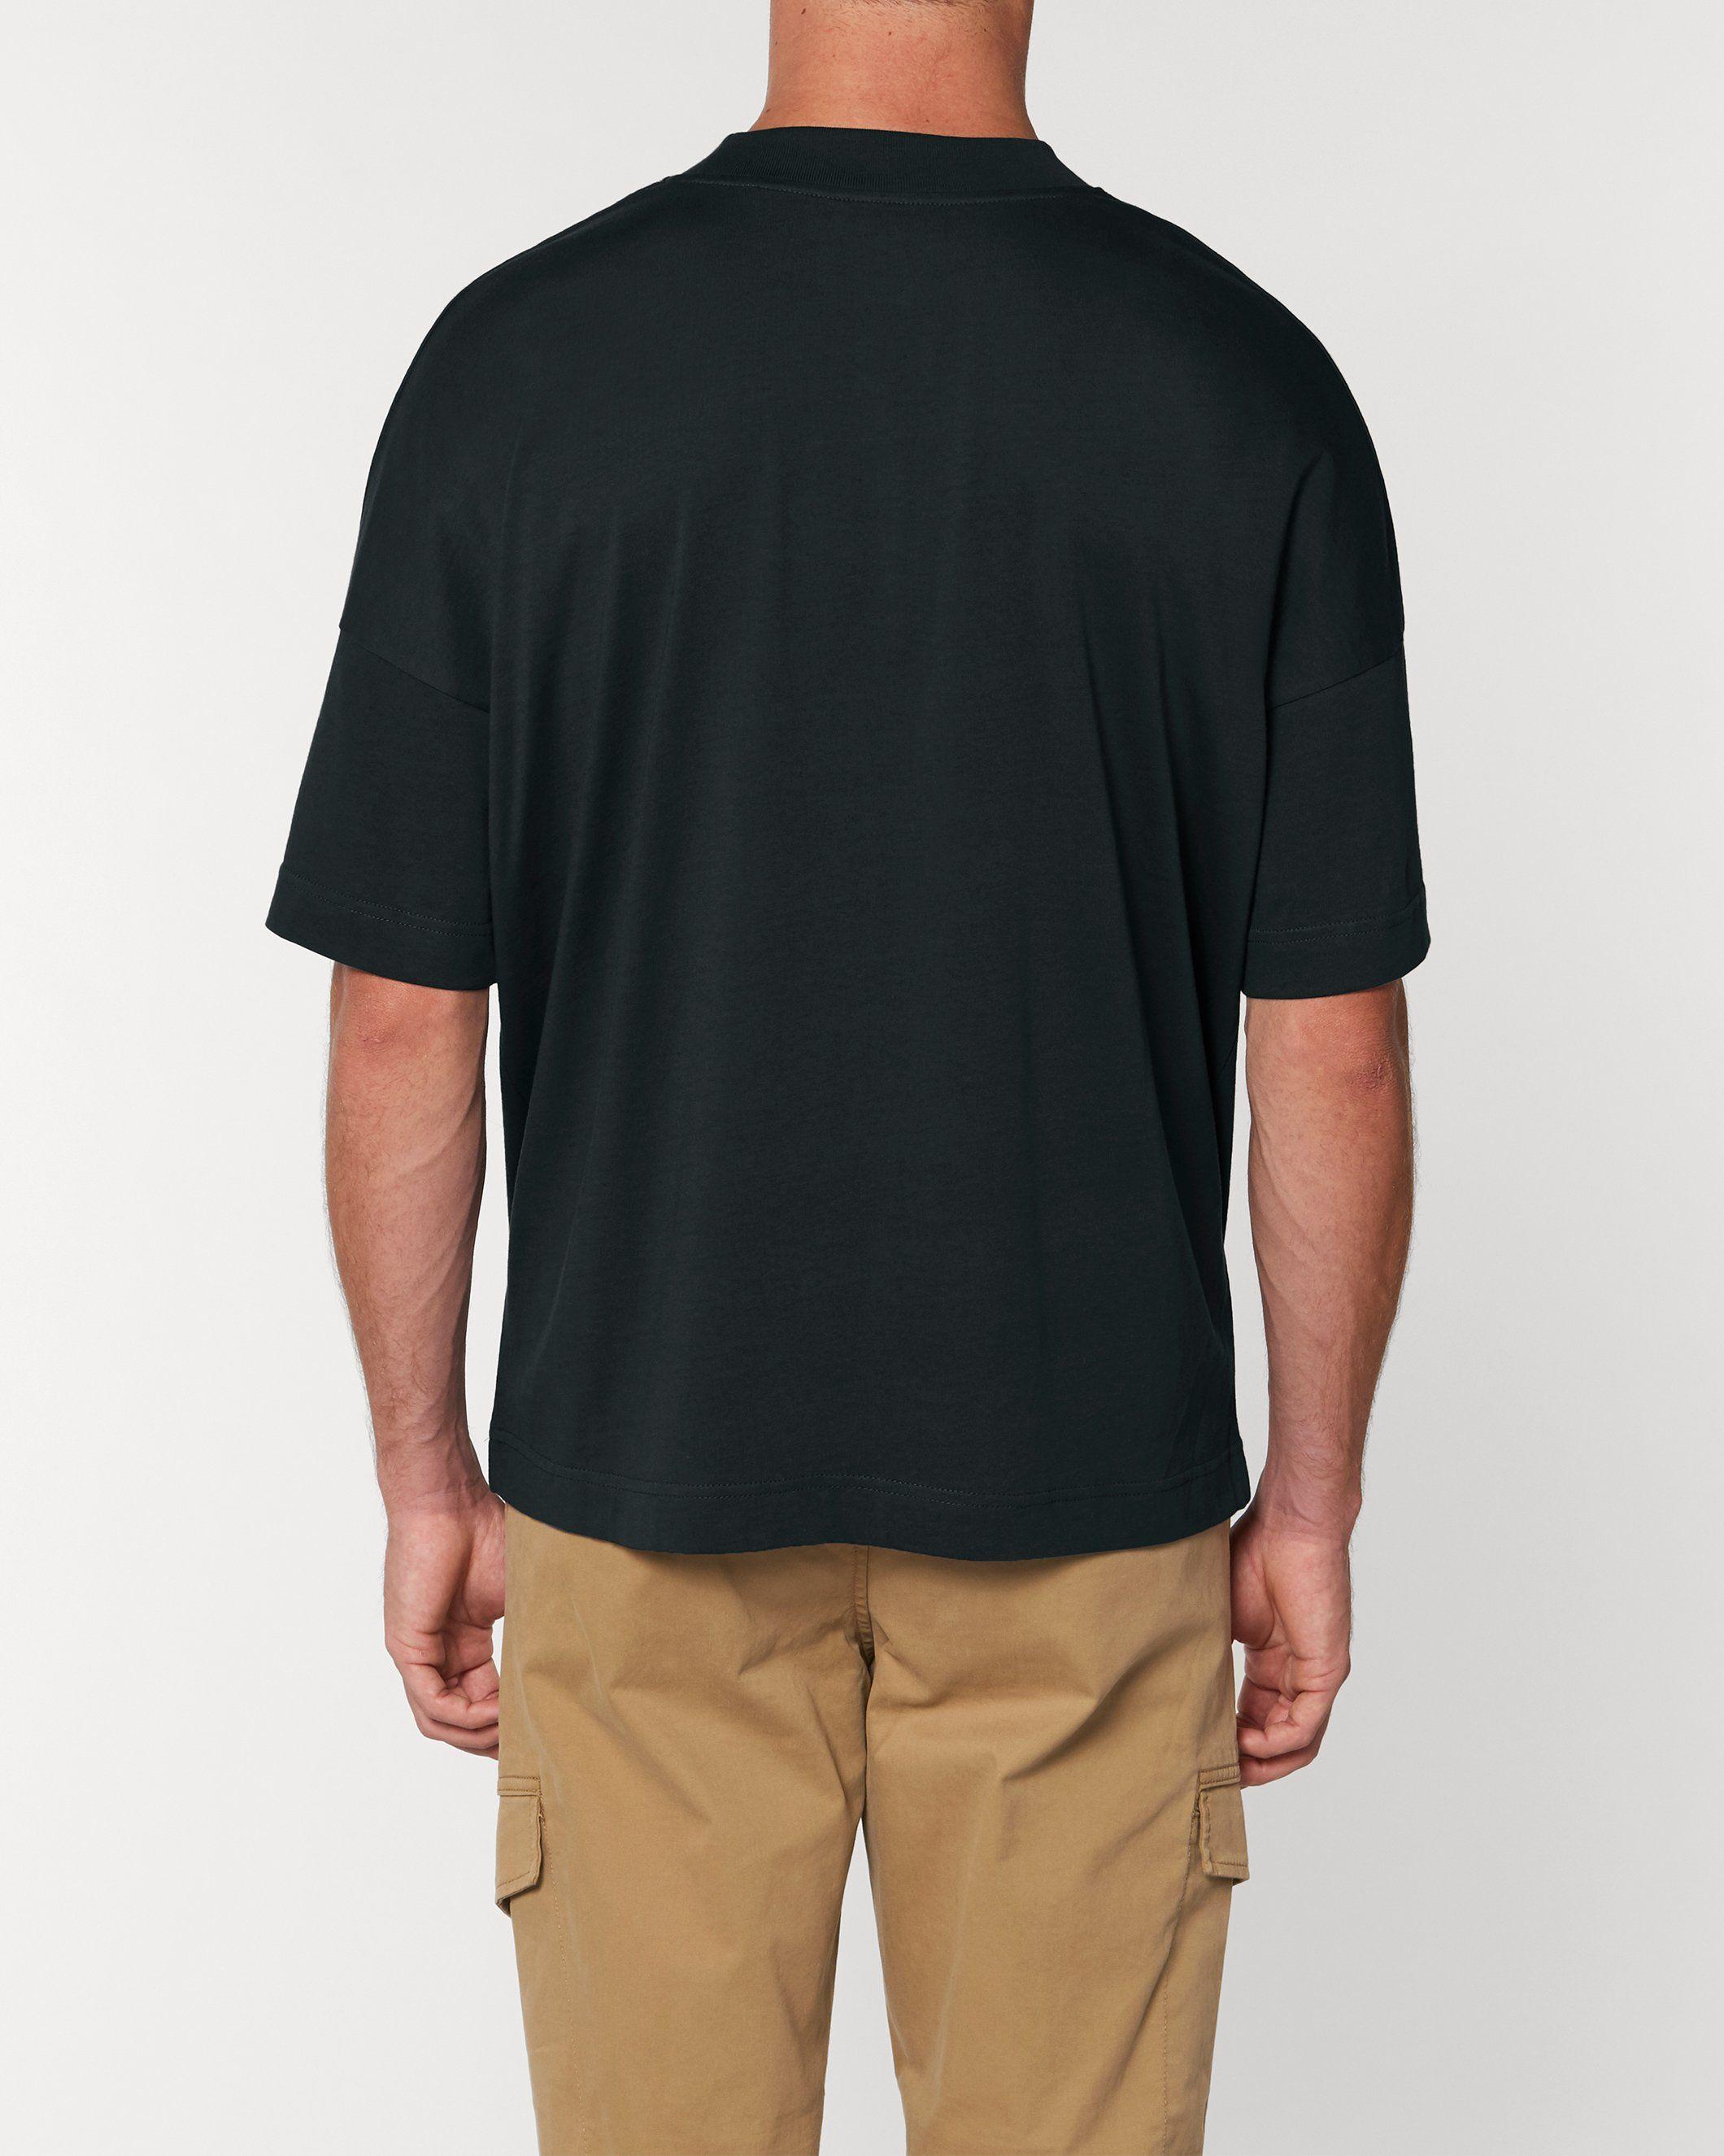 Mantra Unisex Oversized High Neck T-Shirt in Black